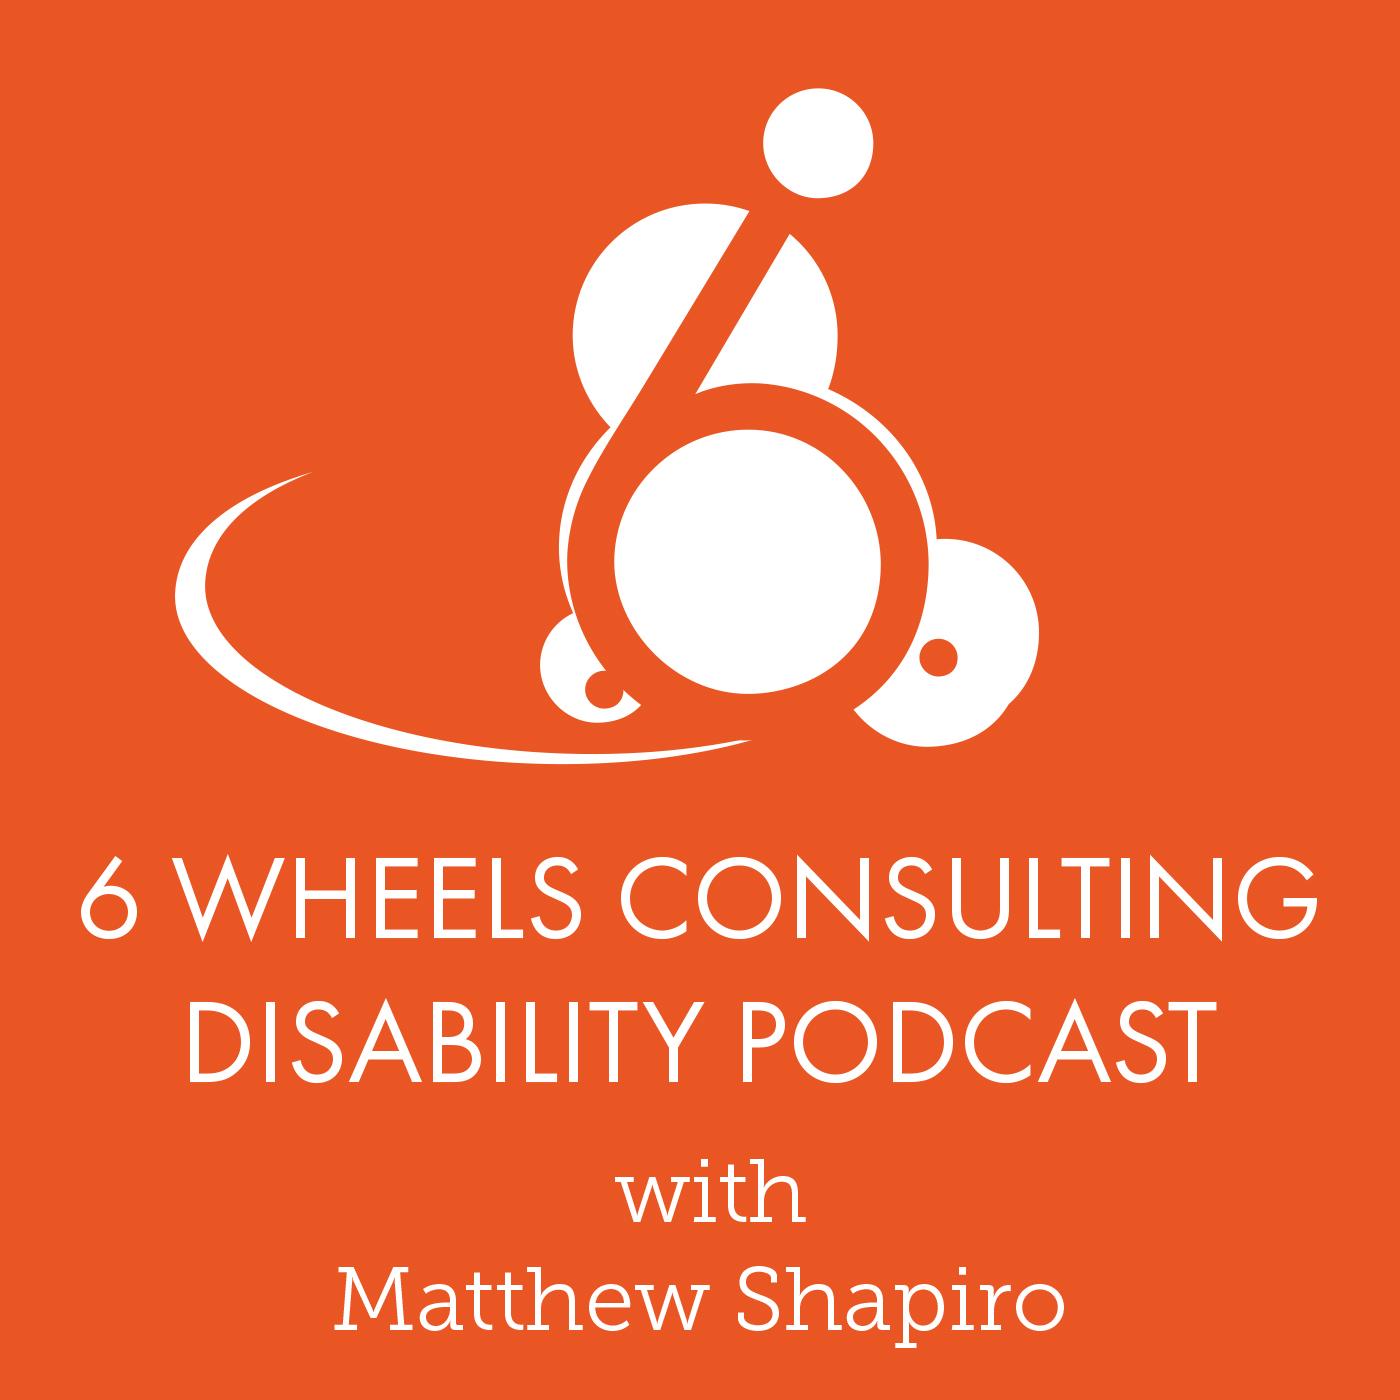 6 Wheels Disability Podcast with Matthew Shapiro show image